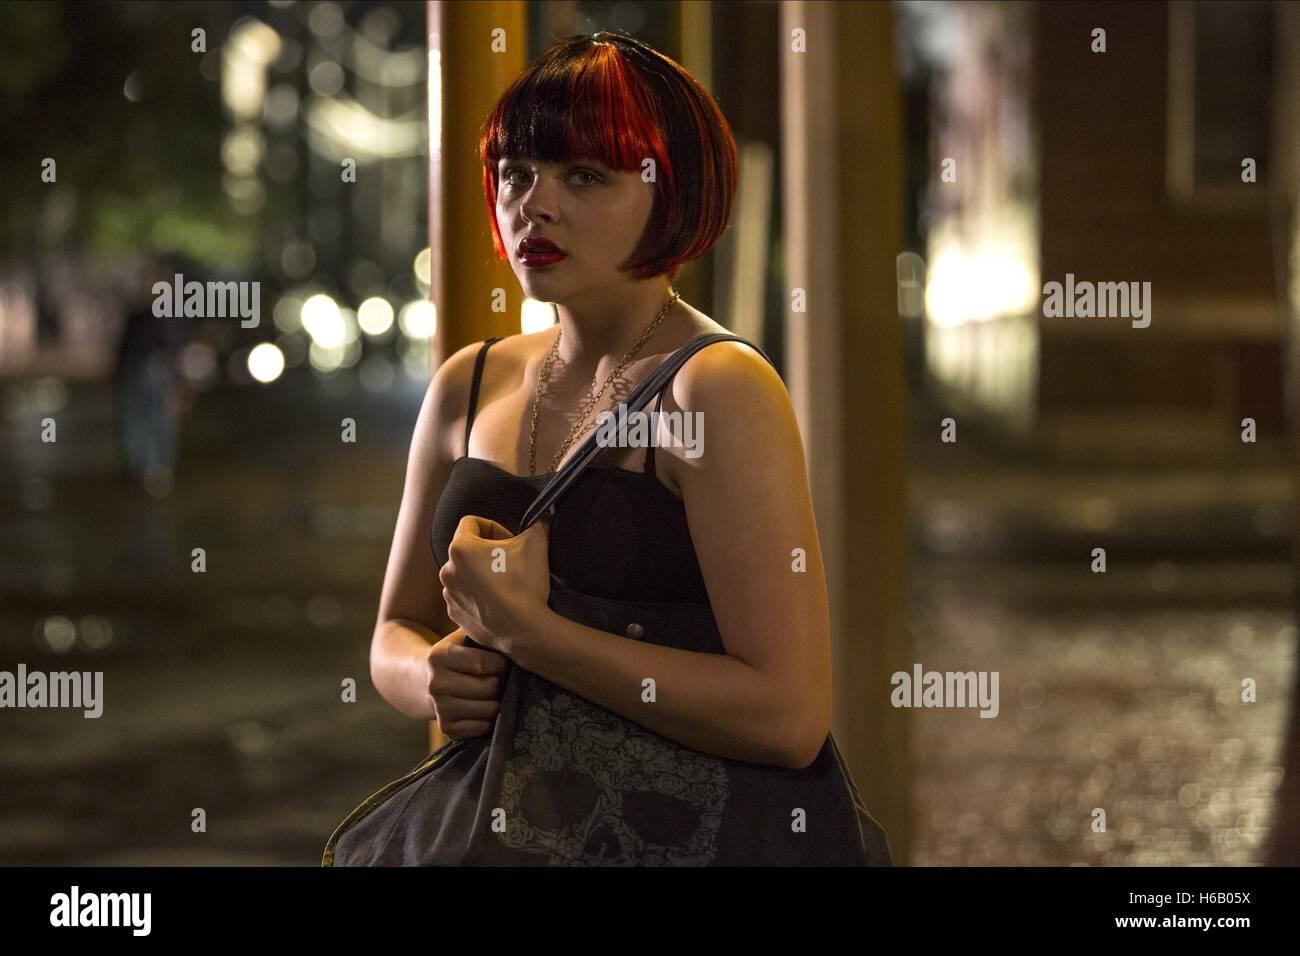 Chloe Grace Moretz The Equalizer 2014 Stock Photo Alamy